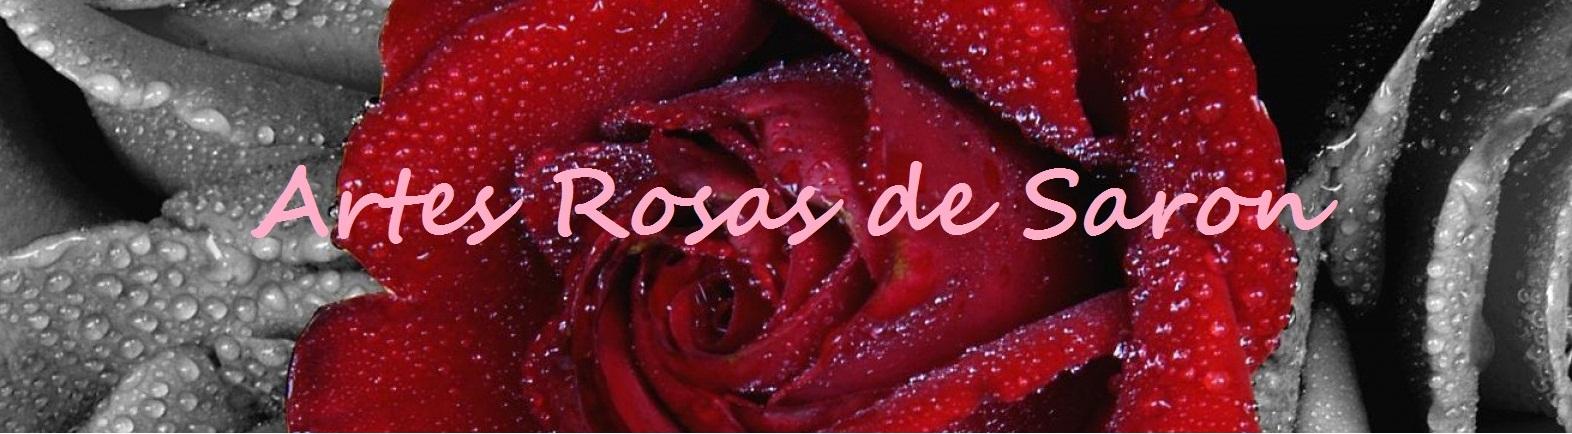 Artes Rosas de Saron